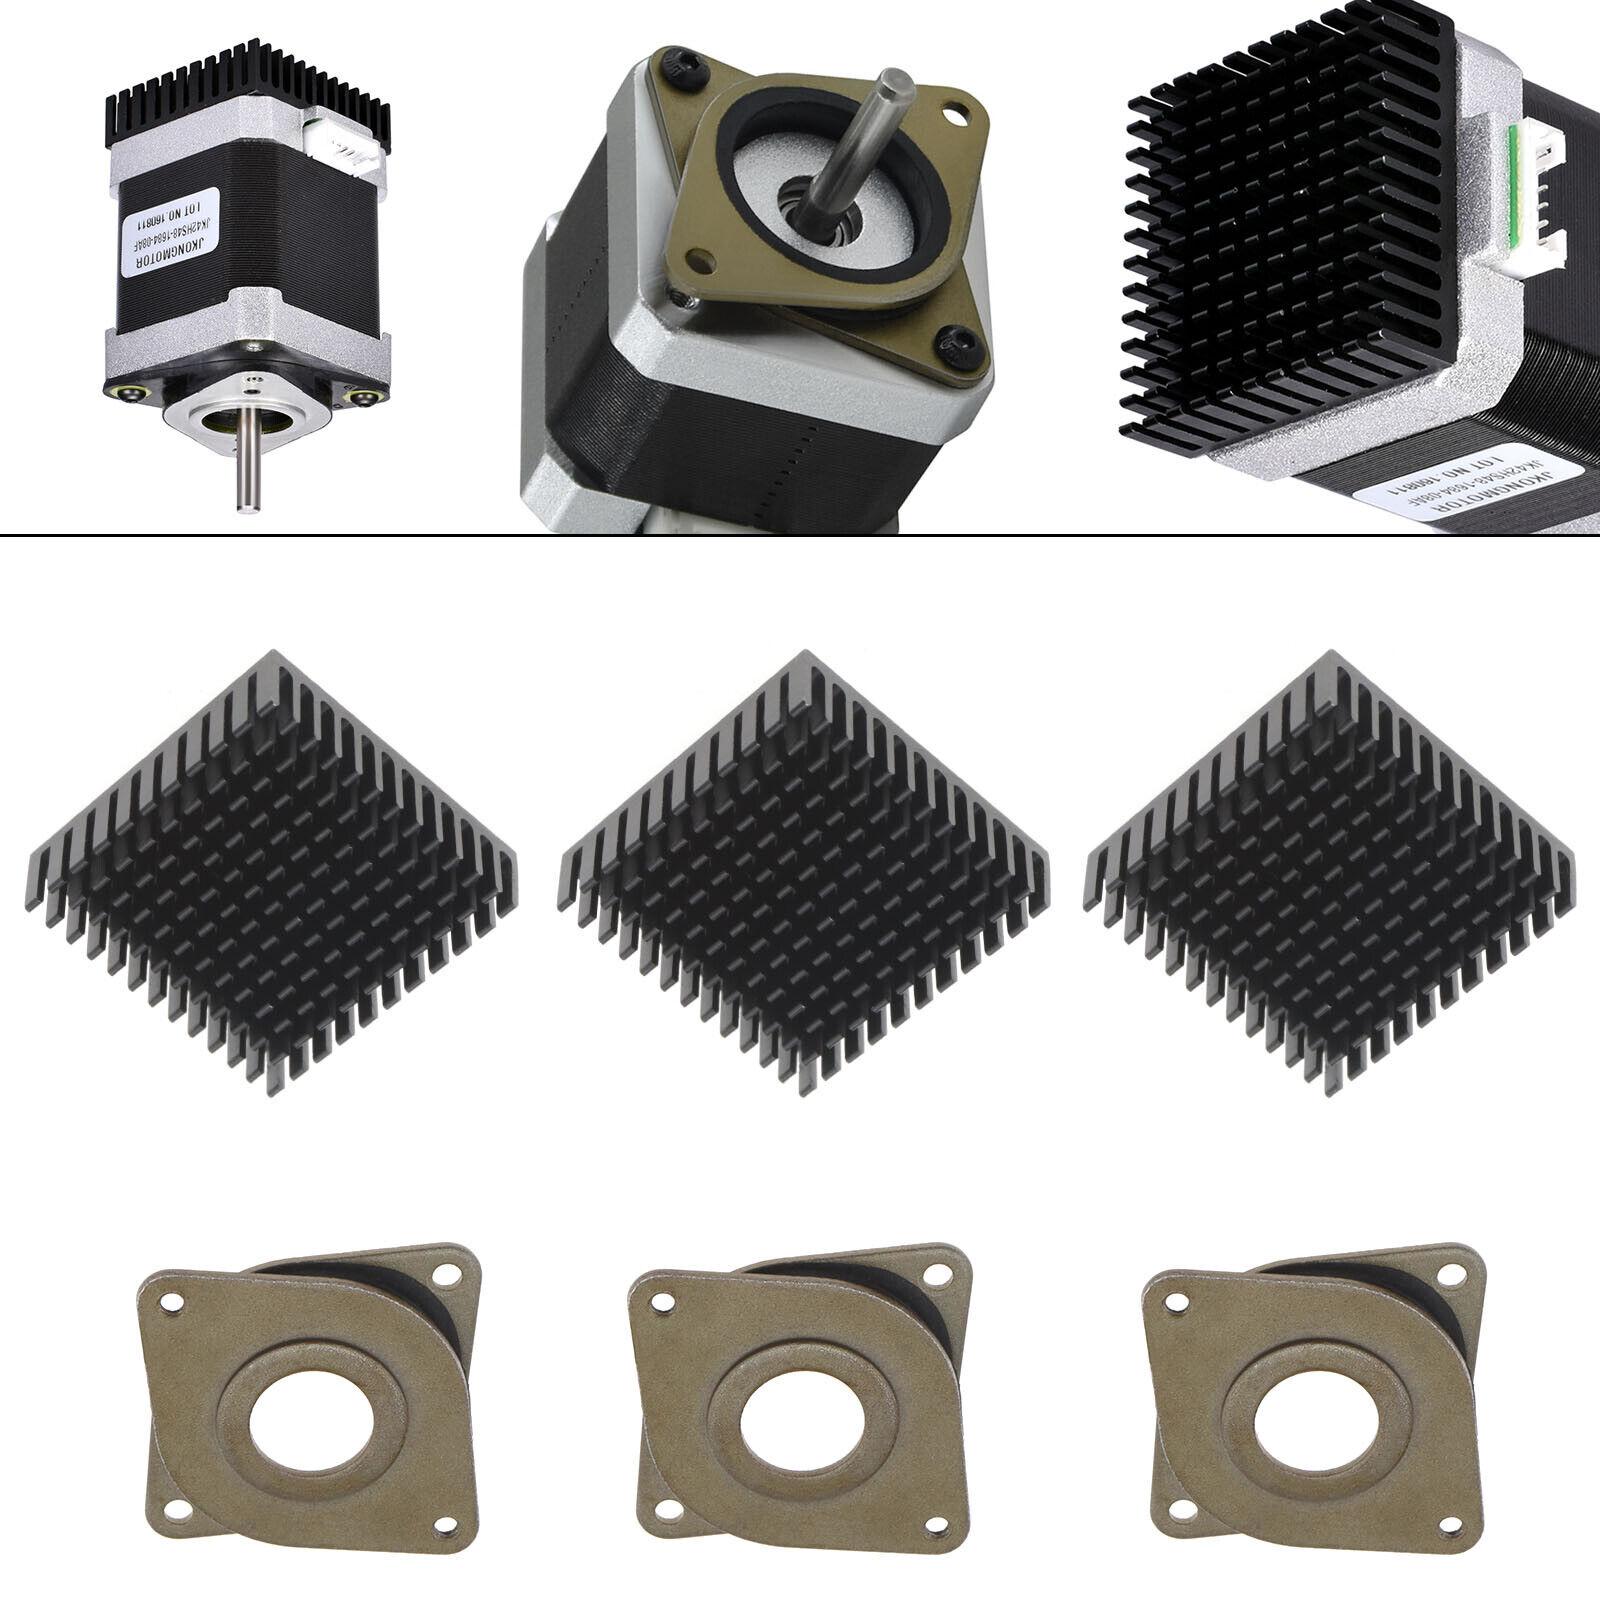 3Pcs Vibration Damper Heatsink for Nema17 3D Printer Repairing Replacement